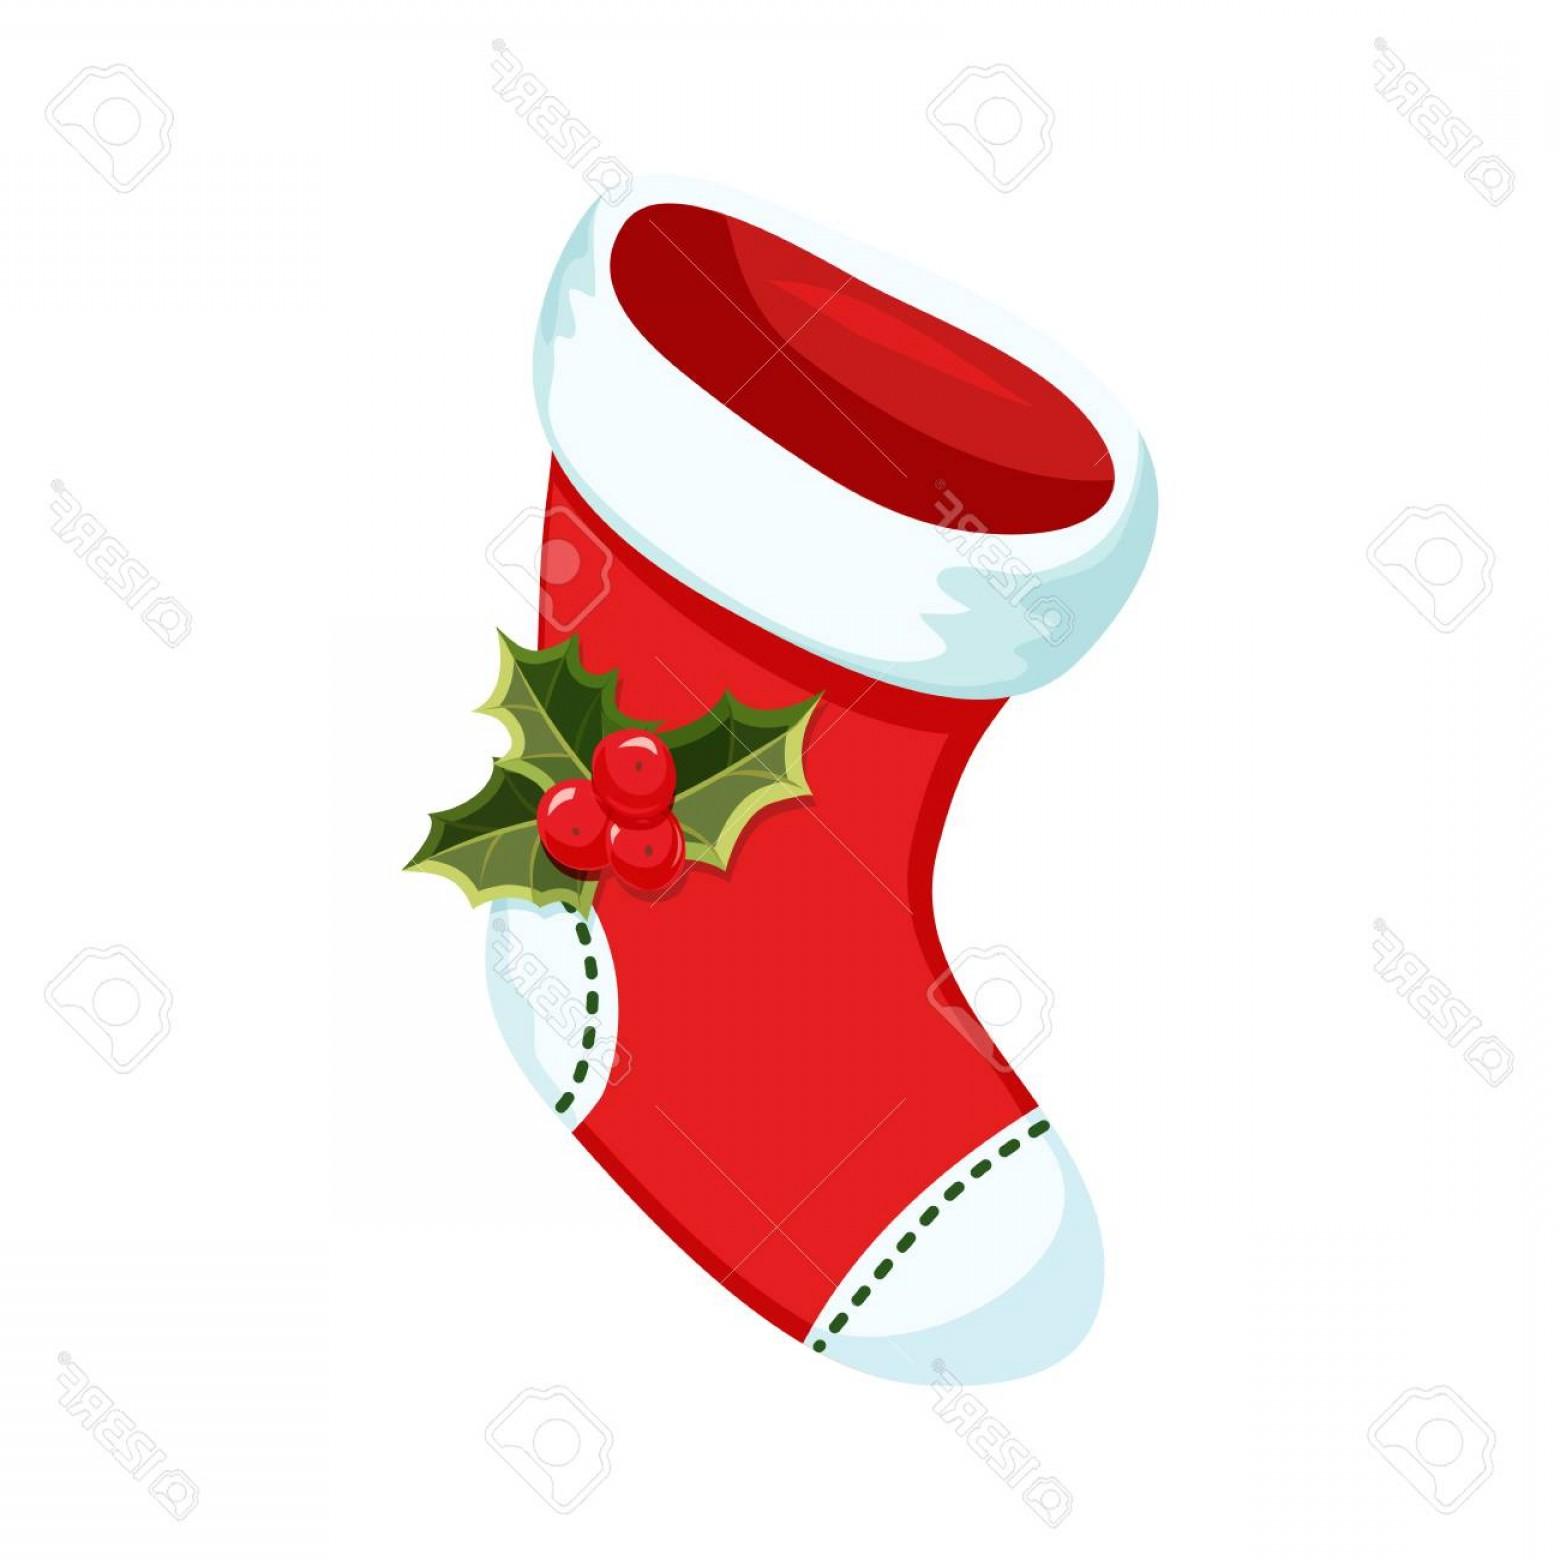 1560x1560 Photostock Vector Christmas Stocking Christmas Holiday Object